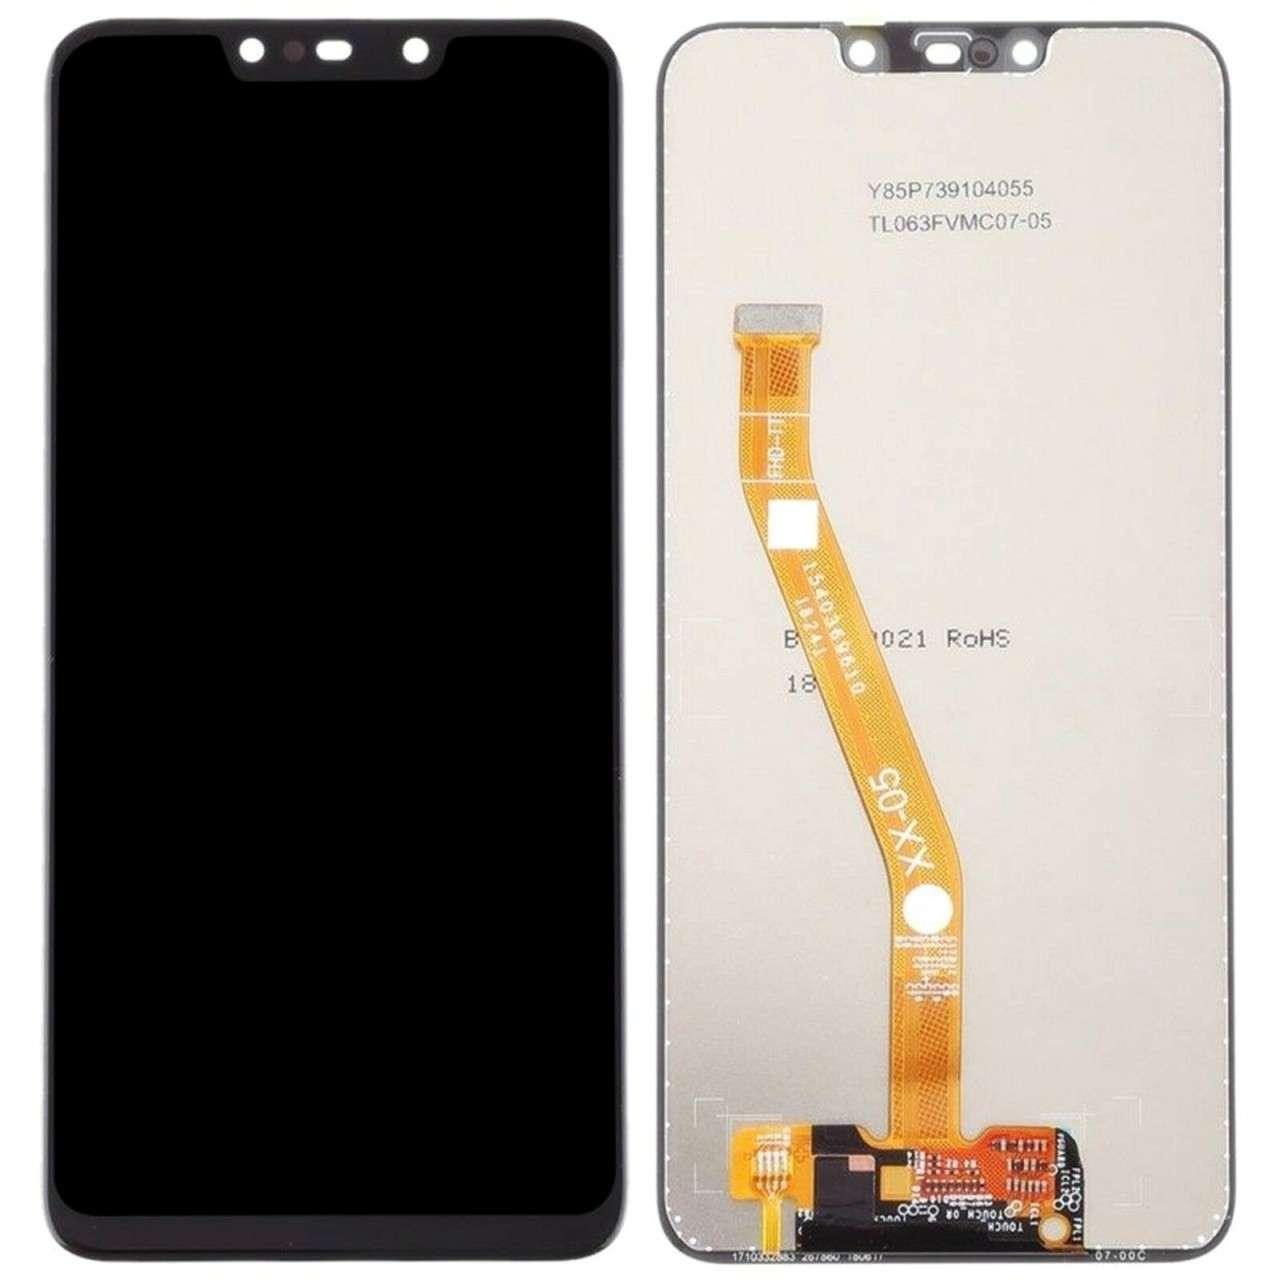 Display Huawei P Smart + 2018 Black Negru imagine powerlaptop.ro 2021